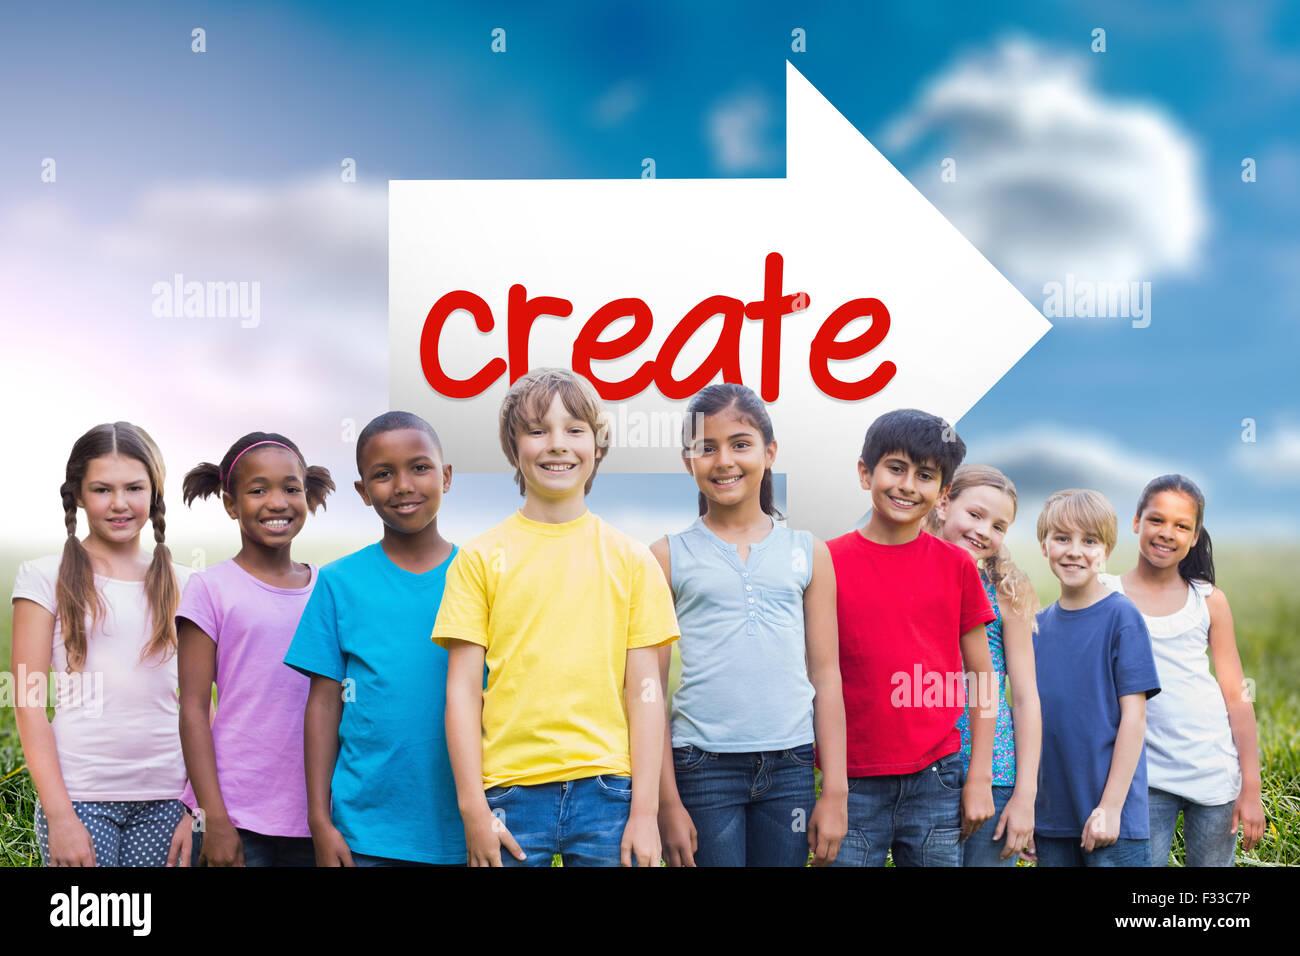 Create against sunny landscape - Stock Image